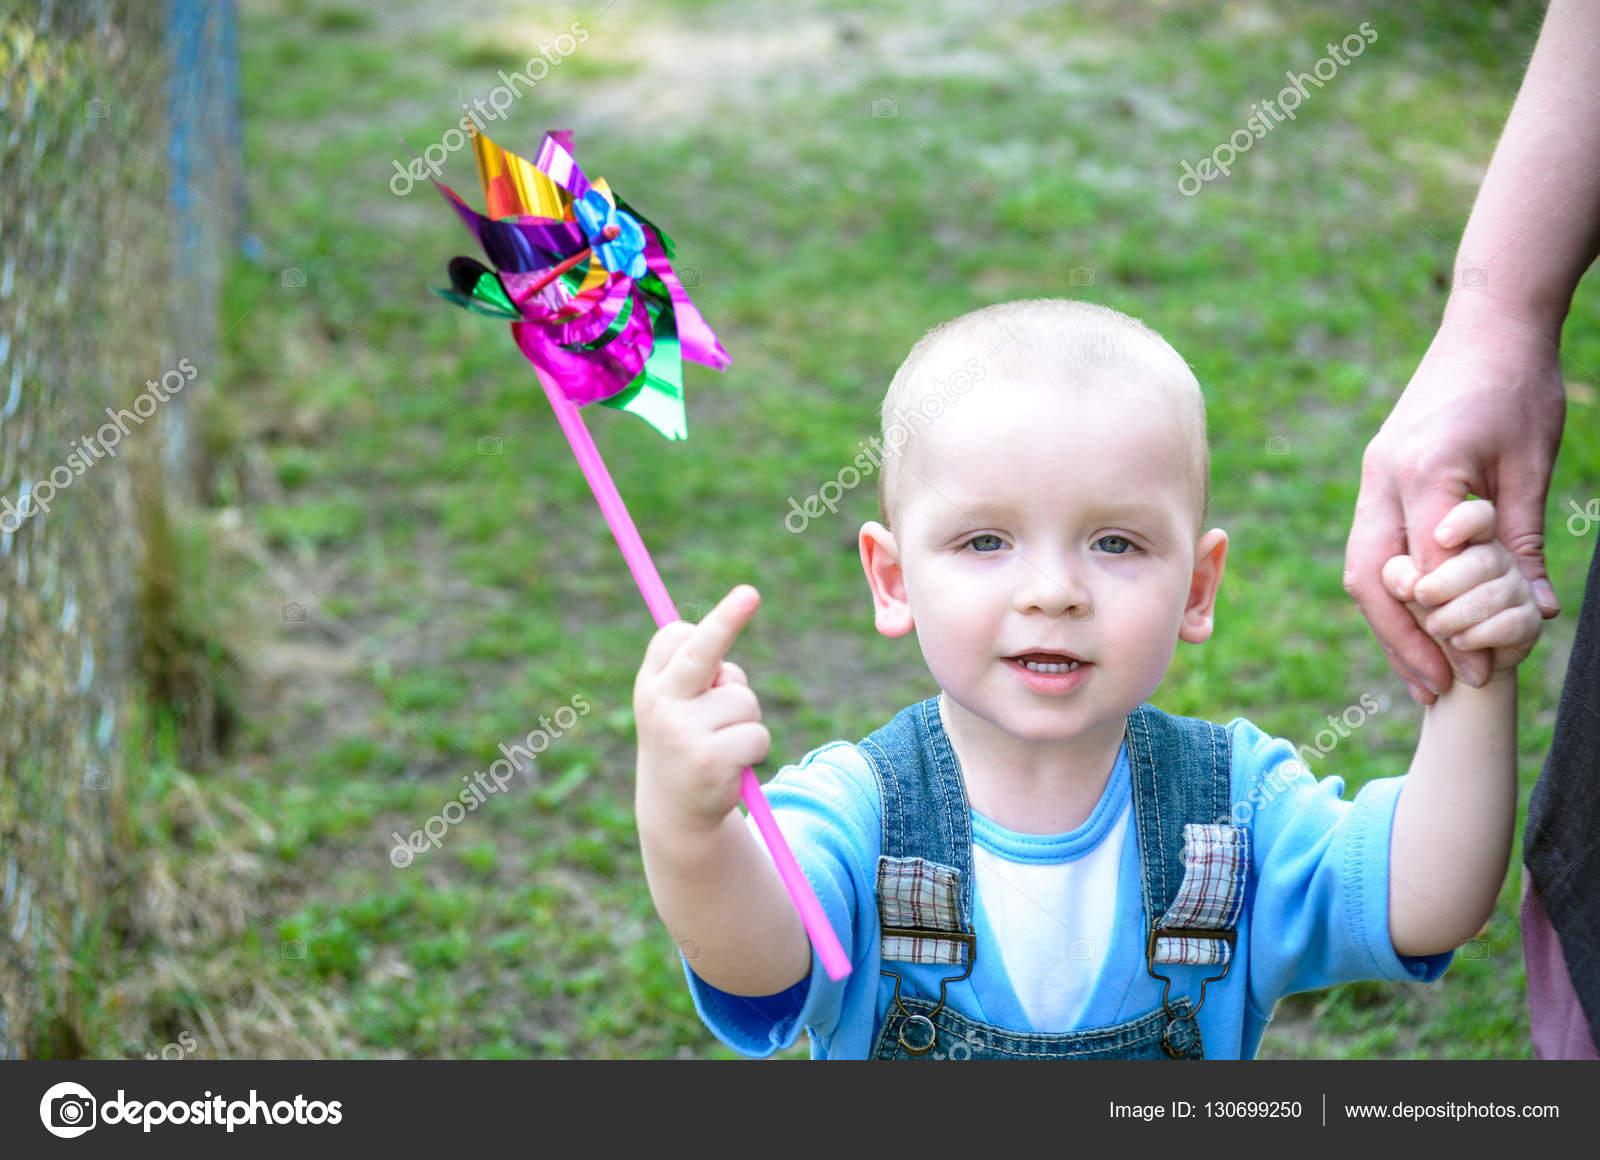 брюнетка трахает мальчика